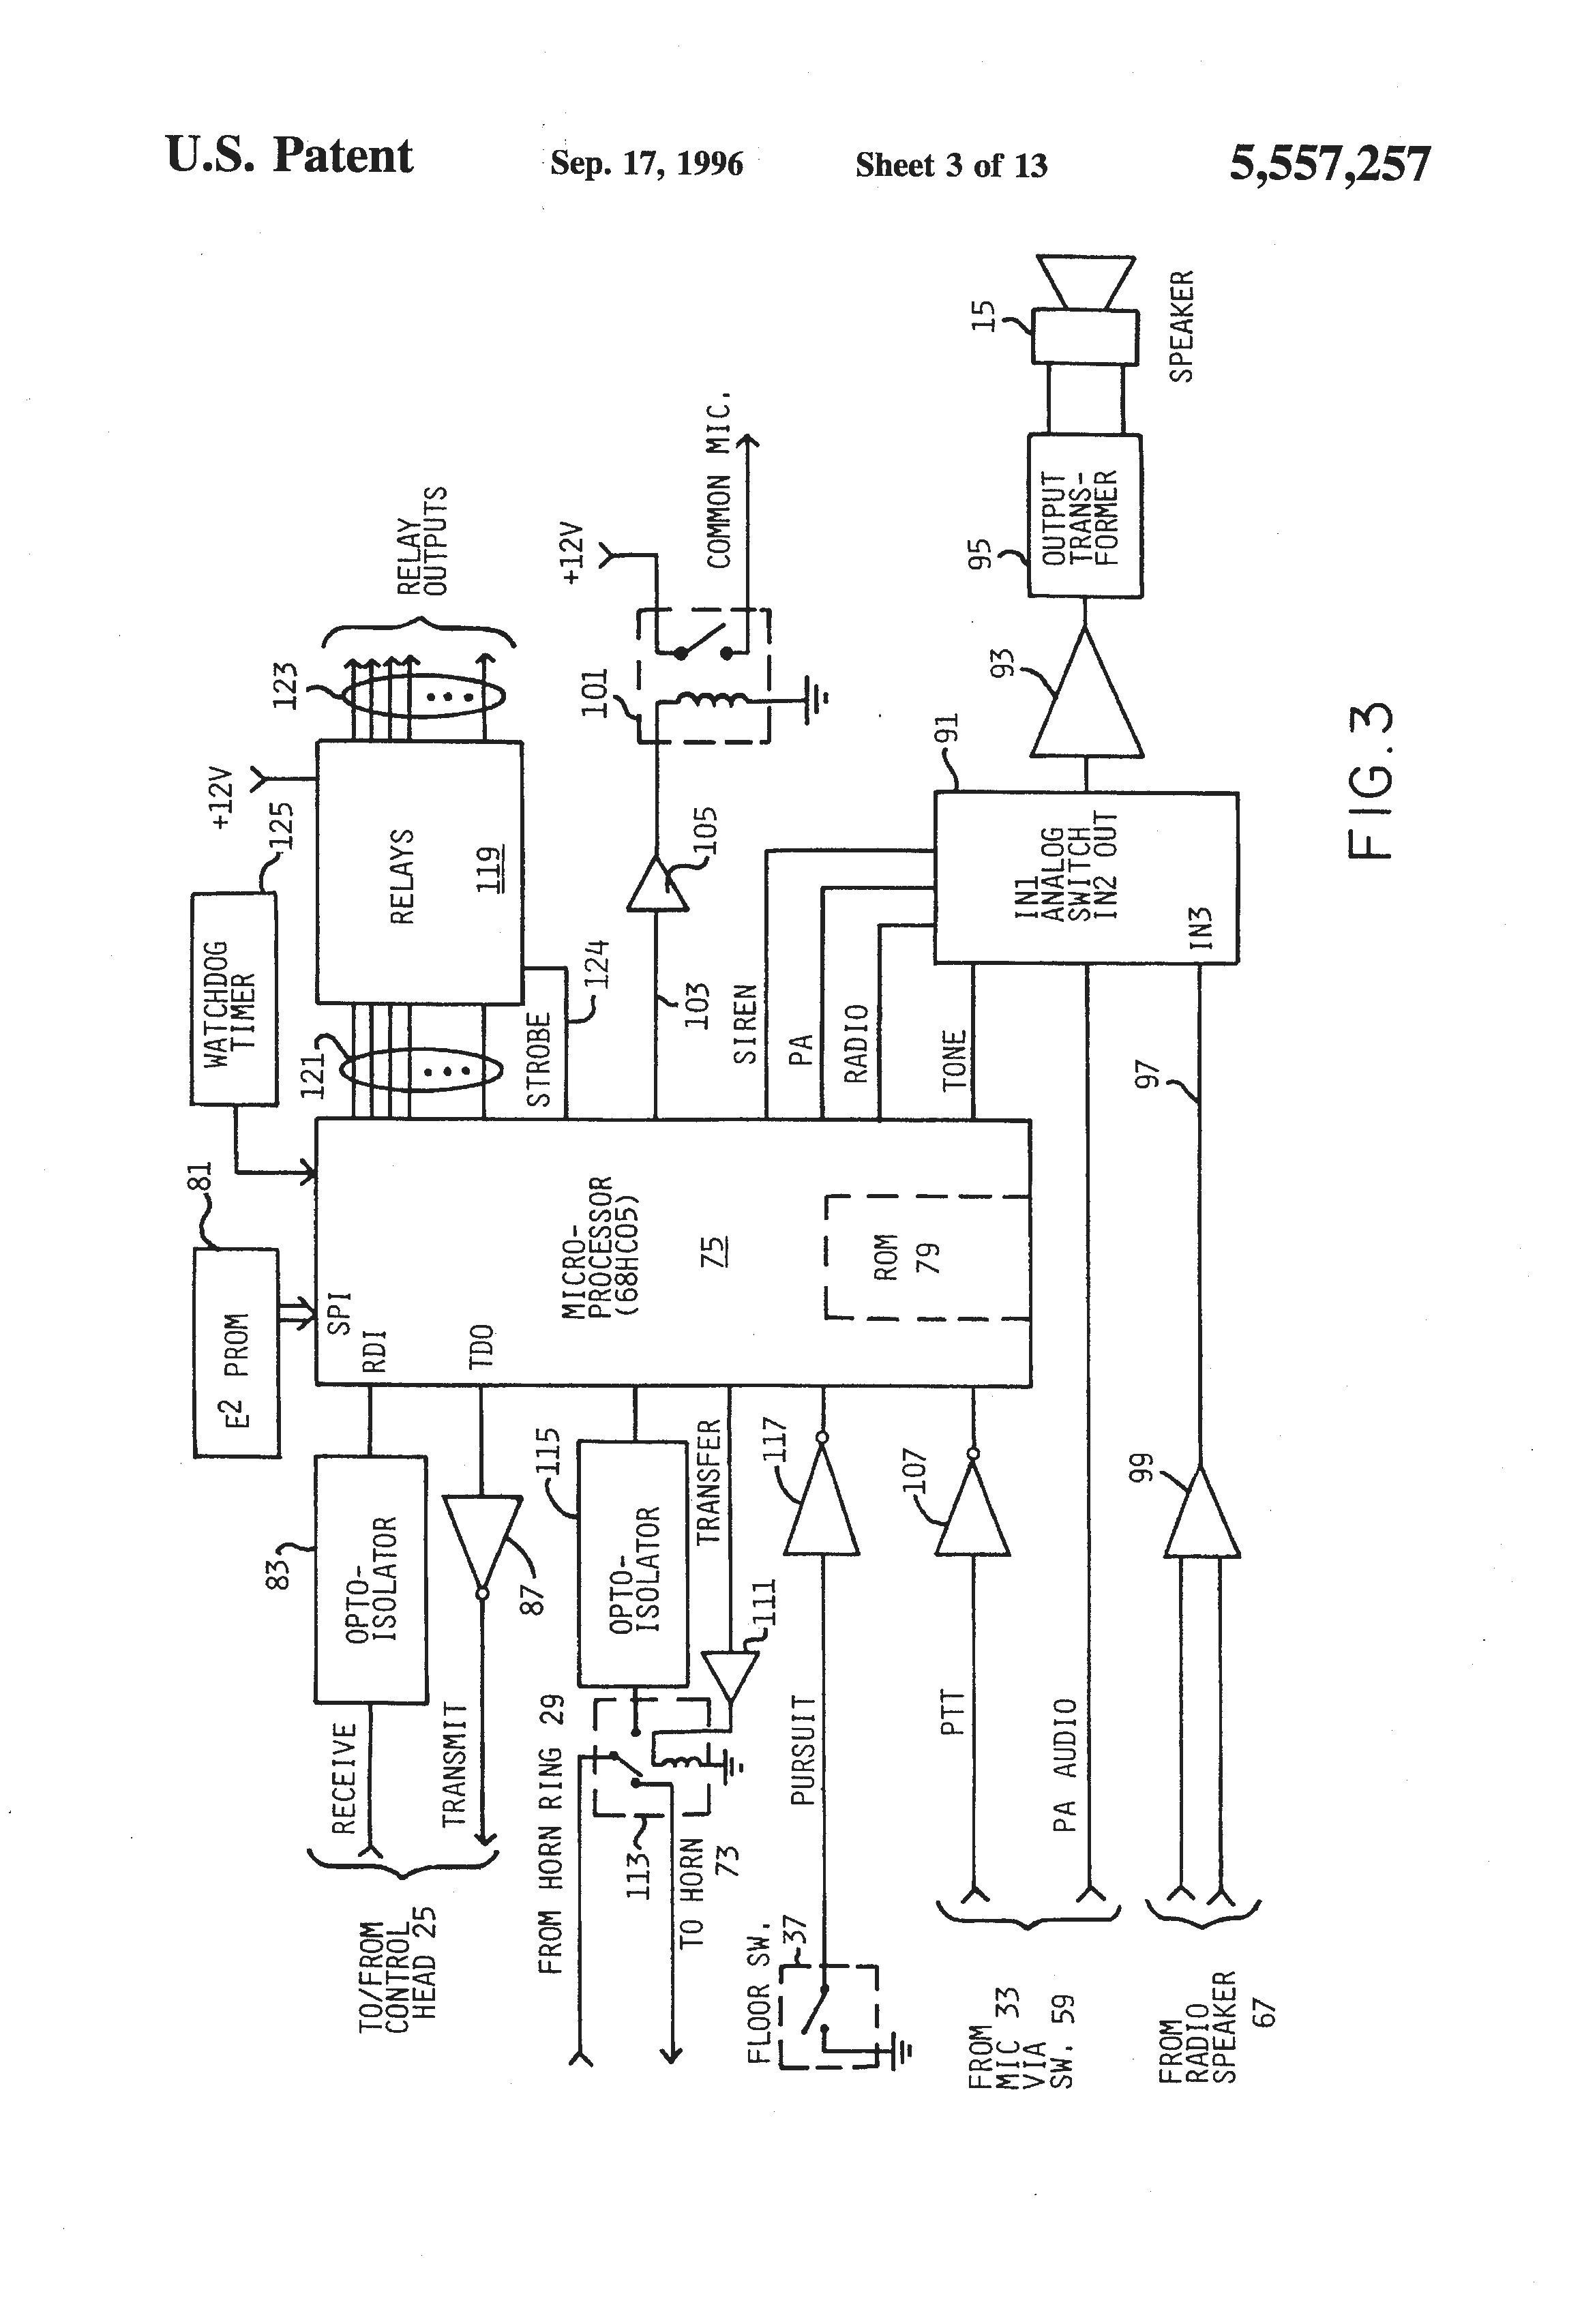 Mace Siren Wiring Diagram | Wiring Diagram on